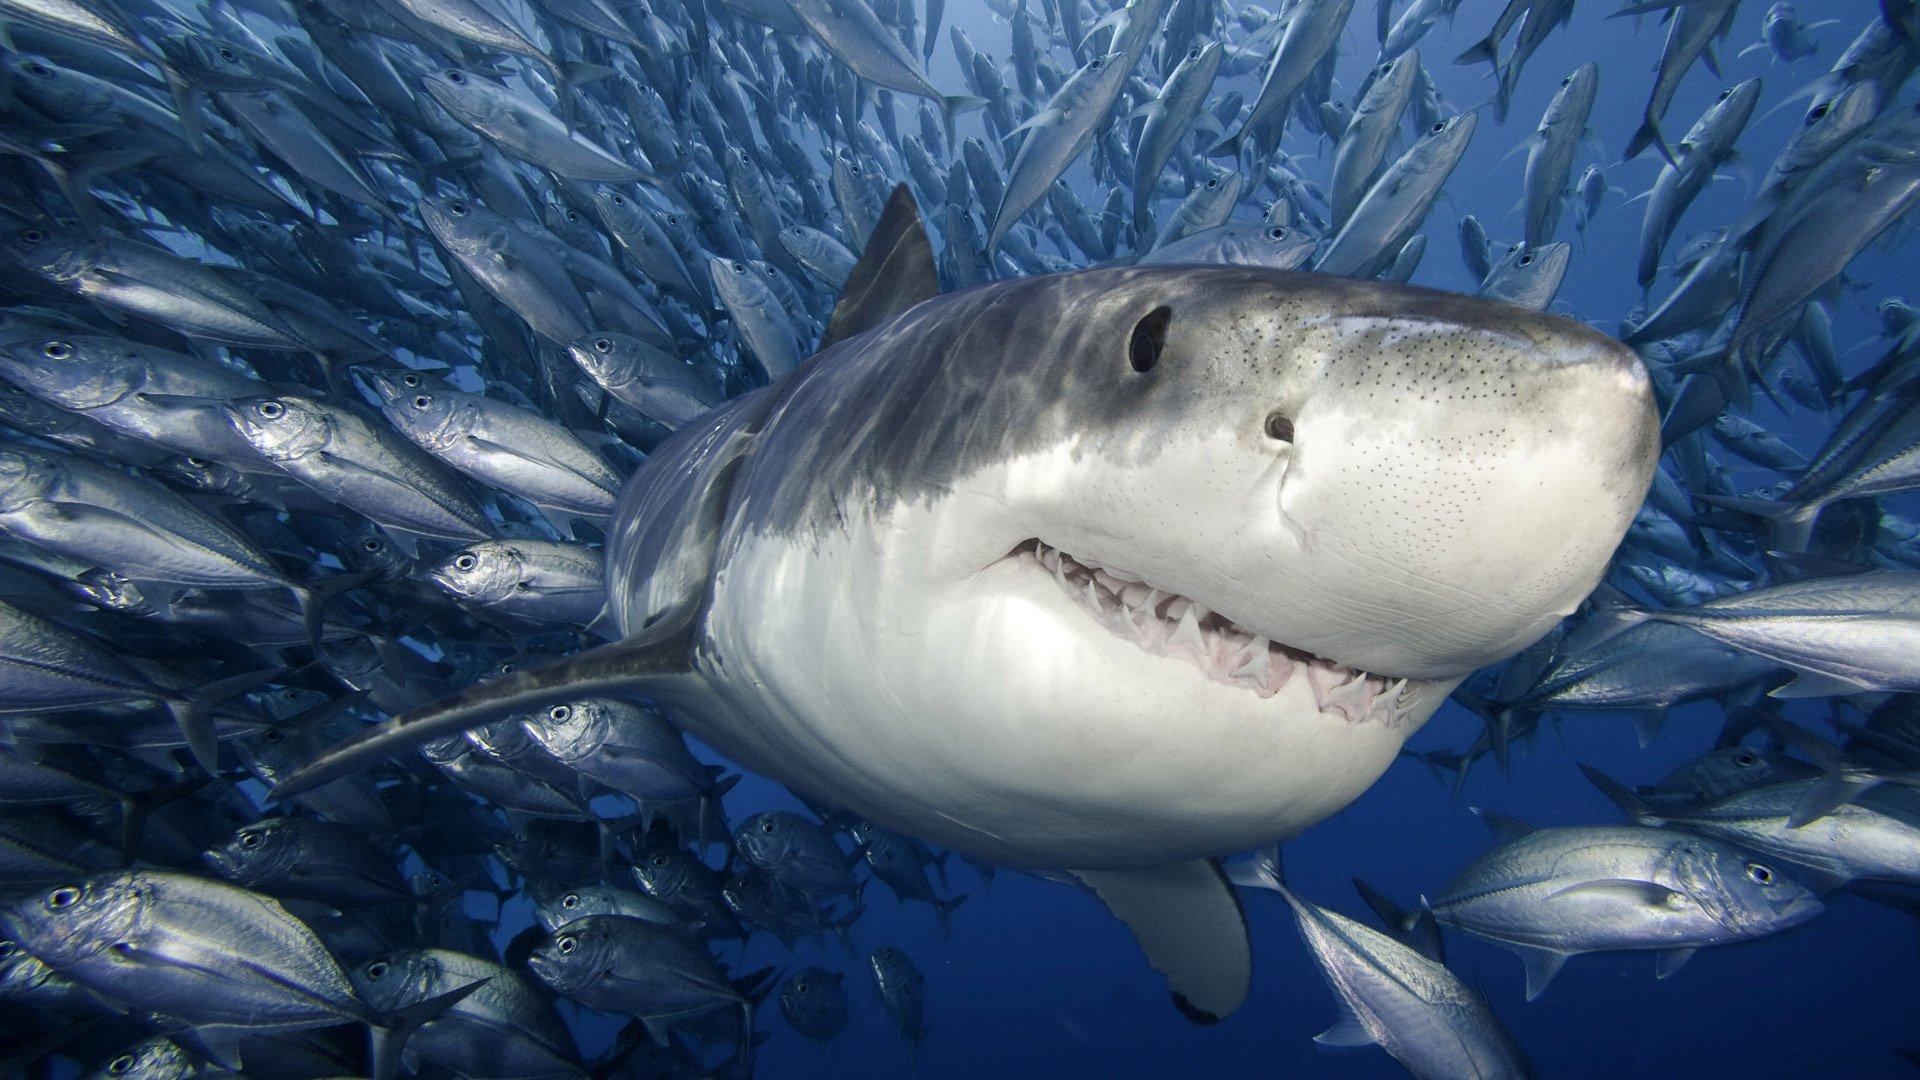 Requin Fond d'écran HD | Arrière-Plan | 1920x1080 | ID:168044 - Wallpaper Abyss